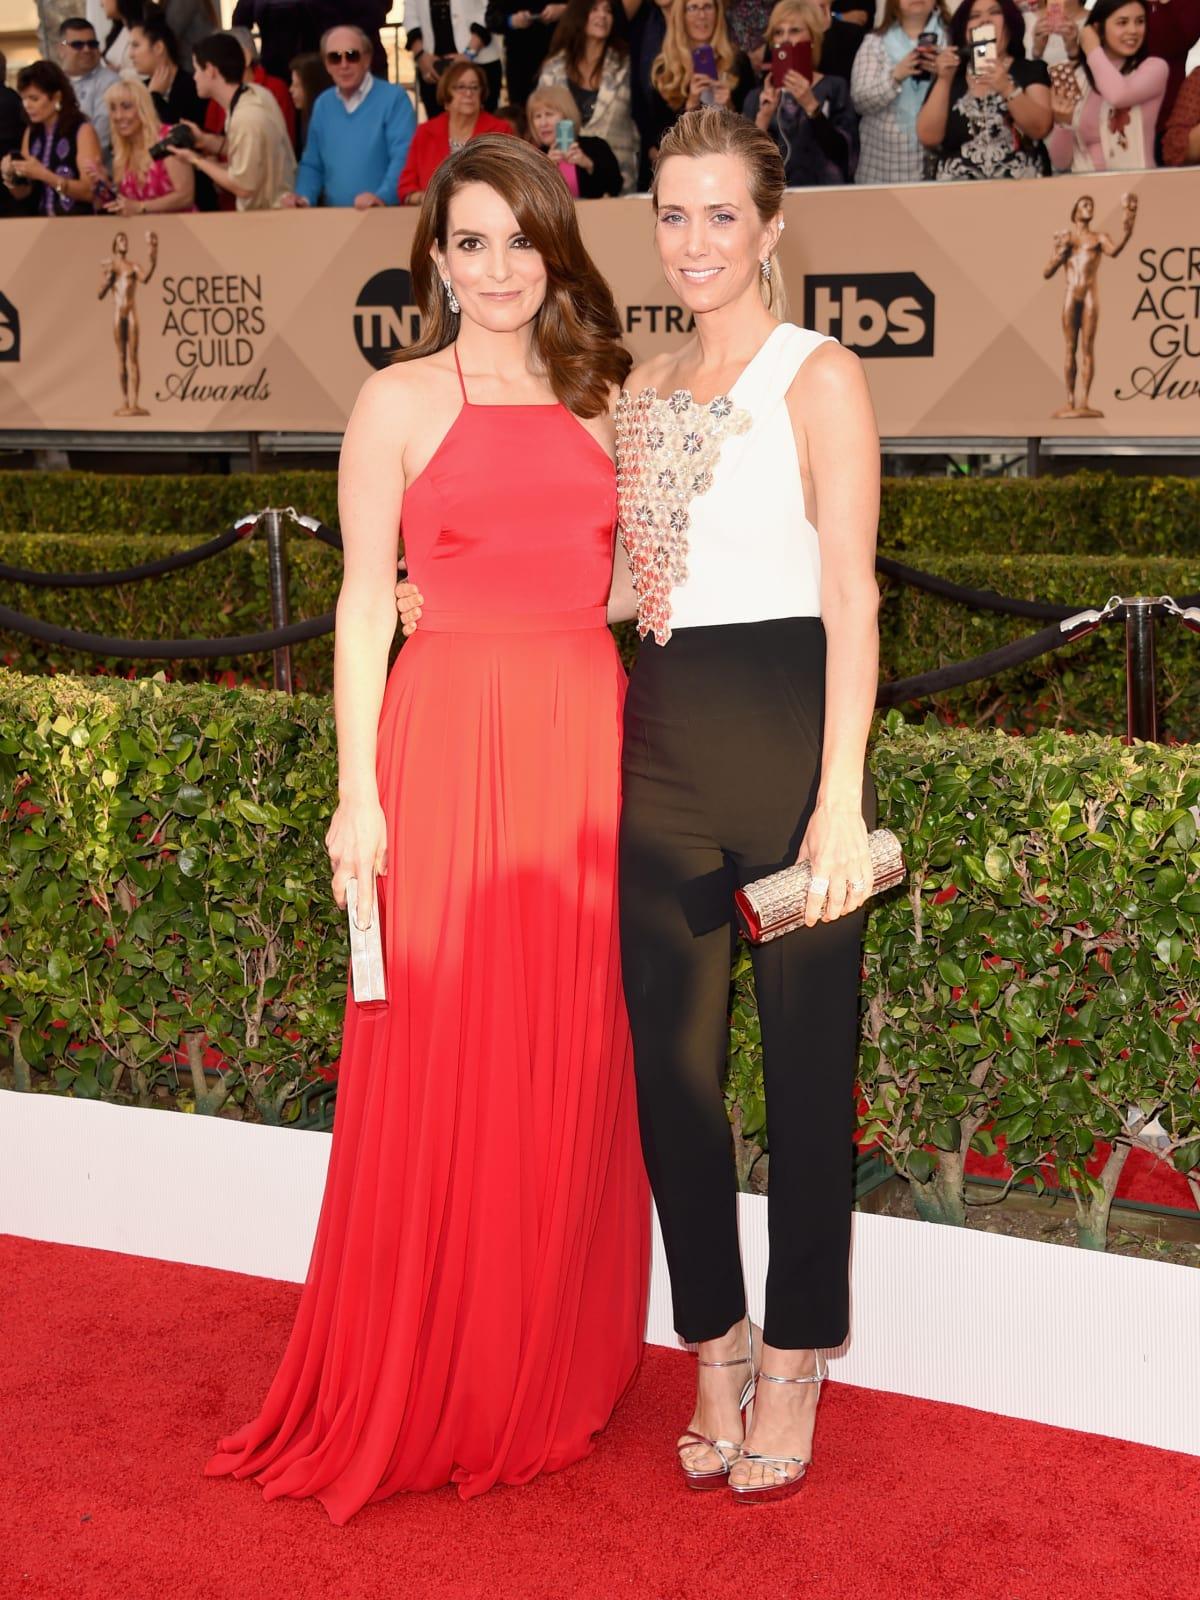 Tina Fey and Kristen Wiig at Screen Actors Guild Awards